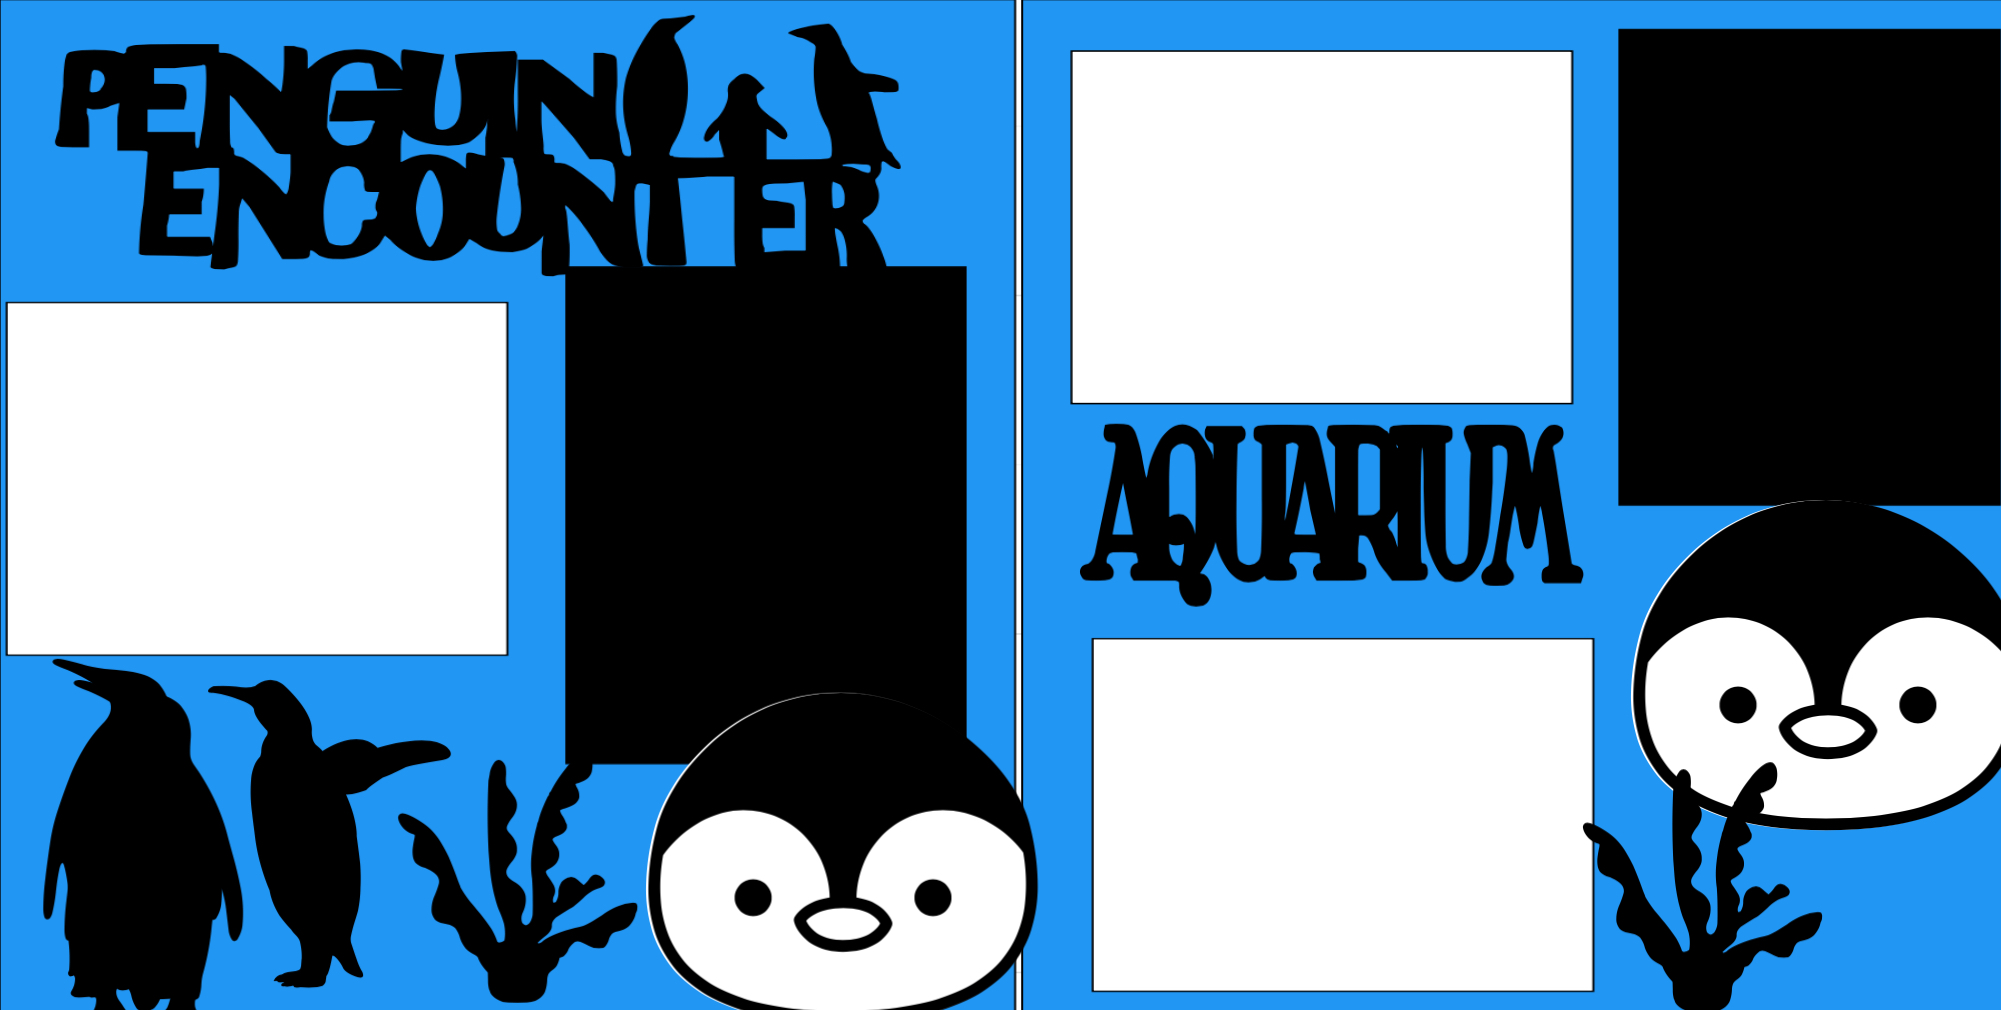 Penguin Encounter aquarium-zoo -  page kit